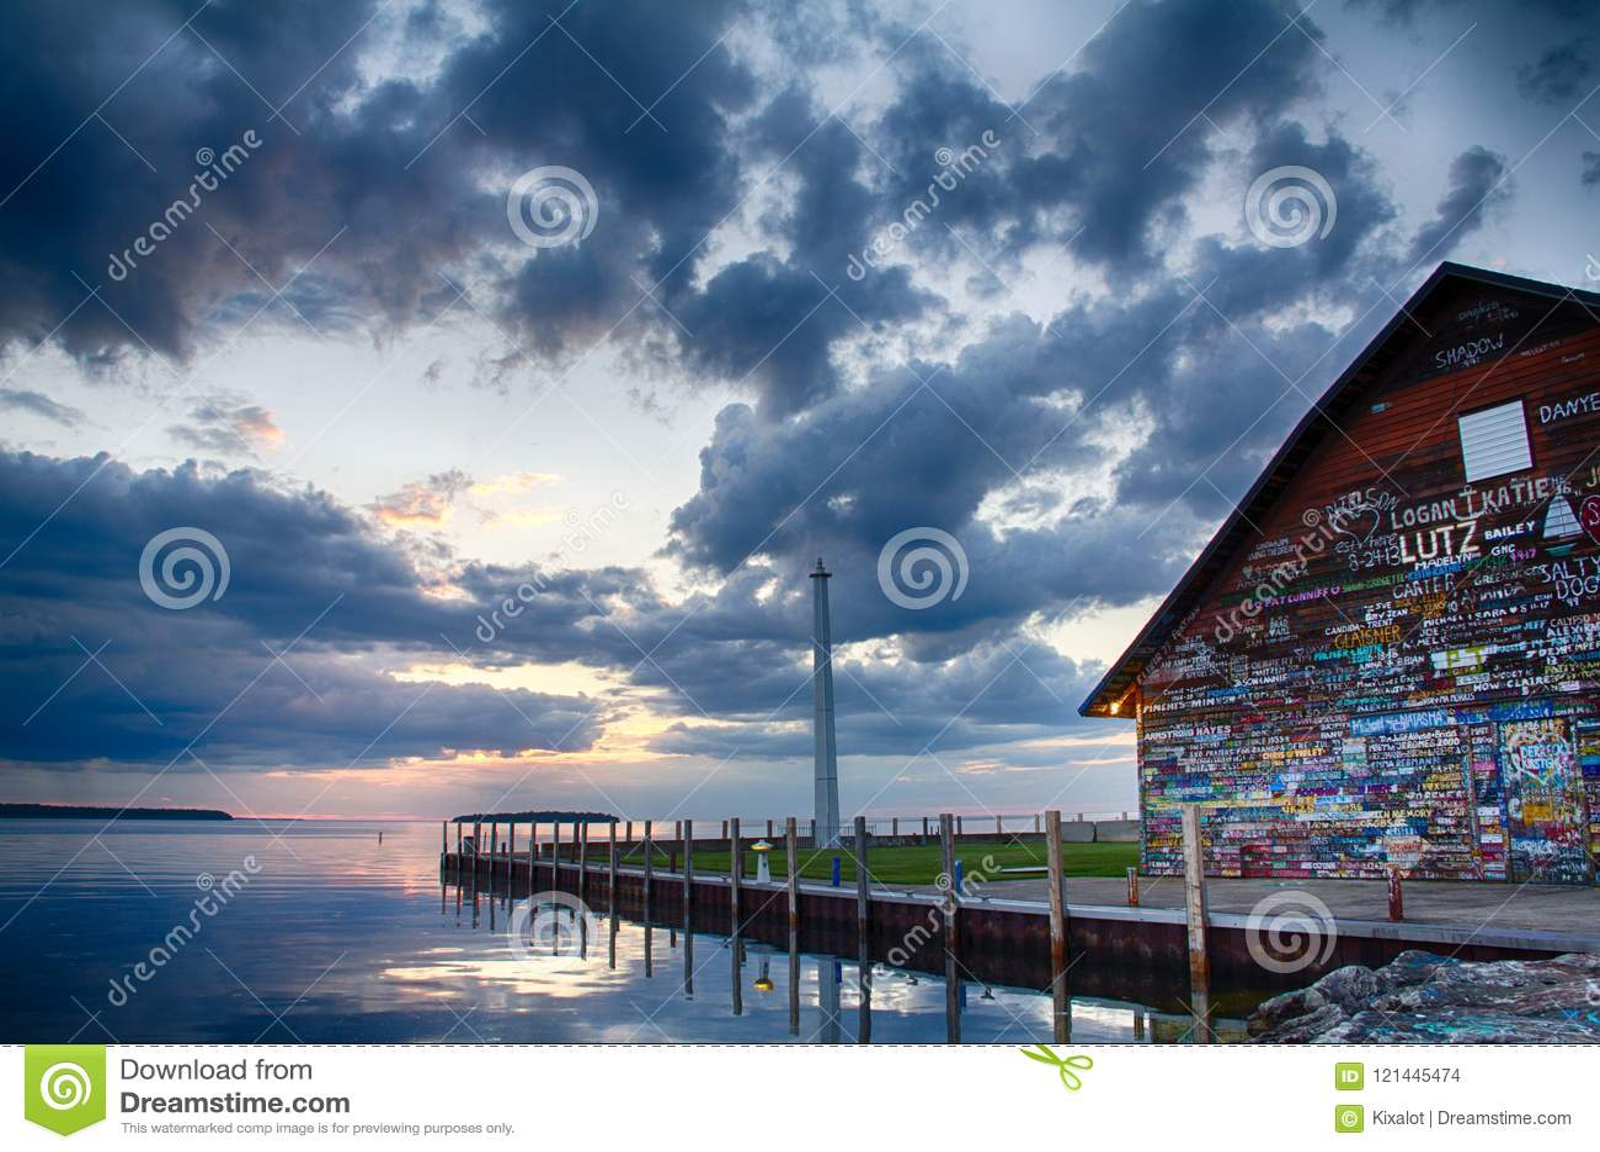 Galerij op Anderson Dock in Ephraim, WI bij Zonsondergang